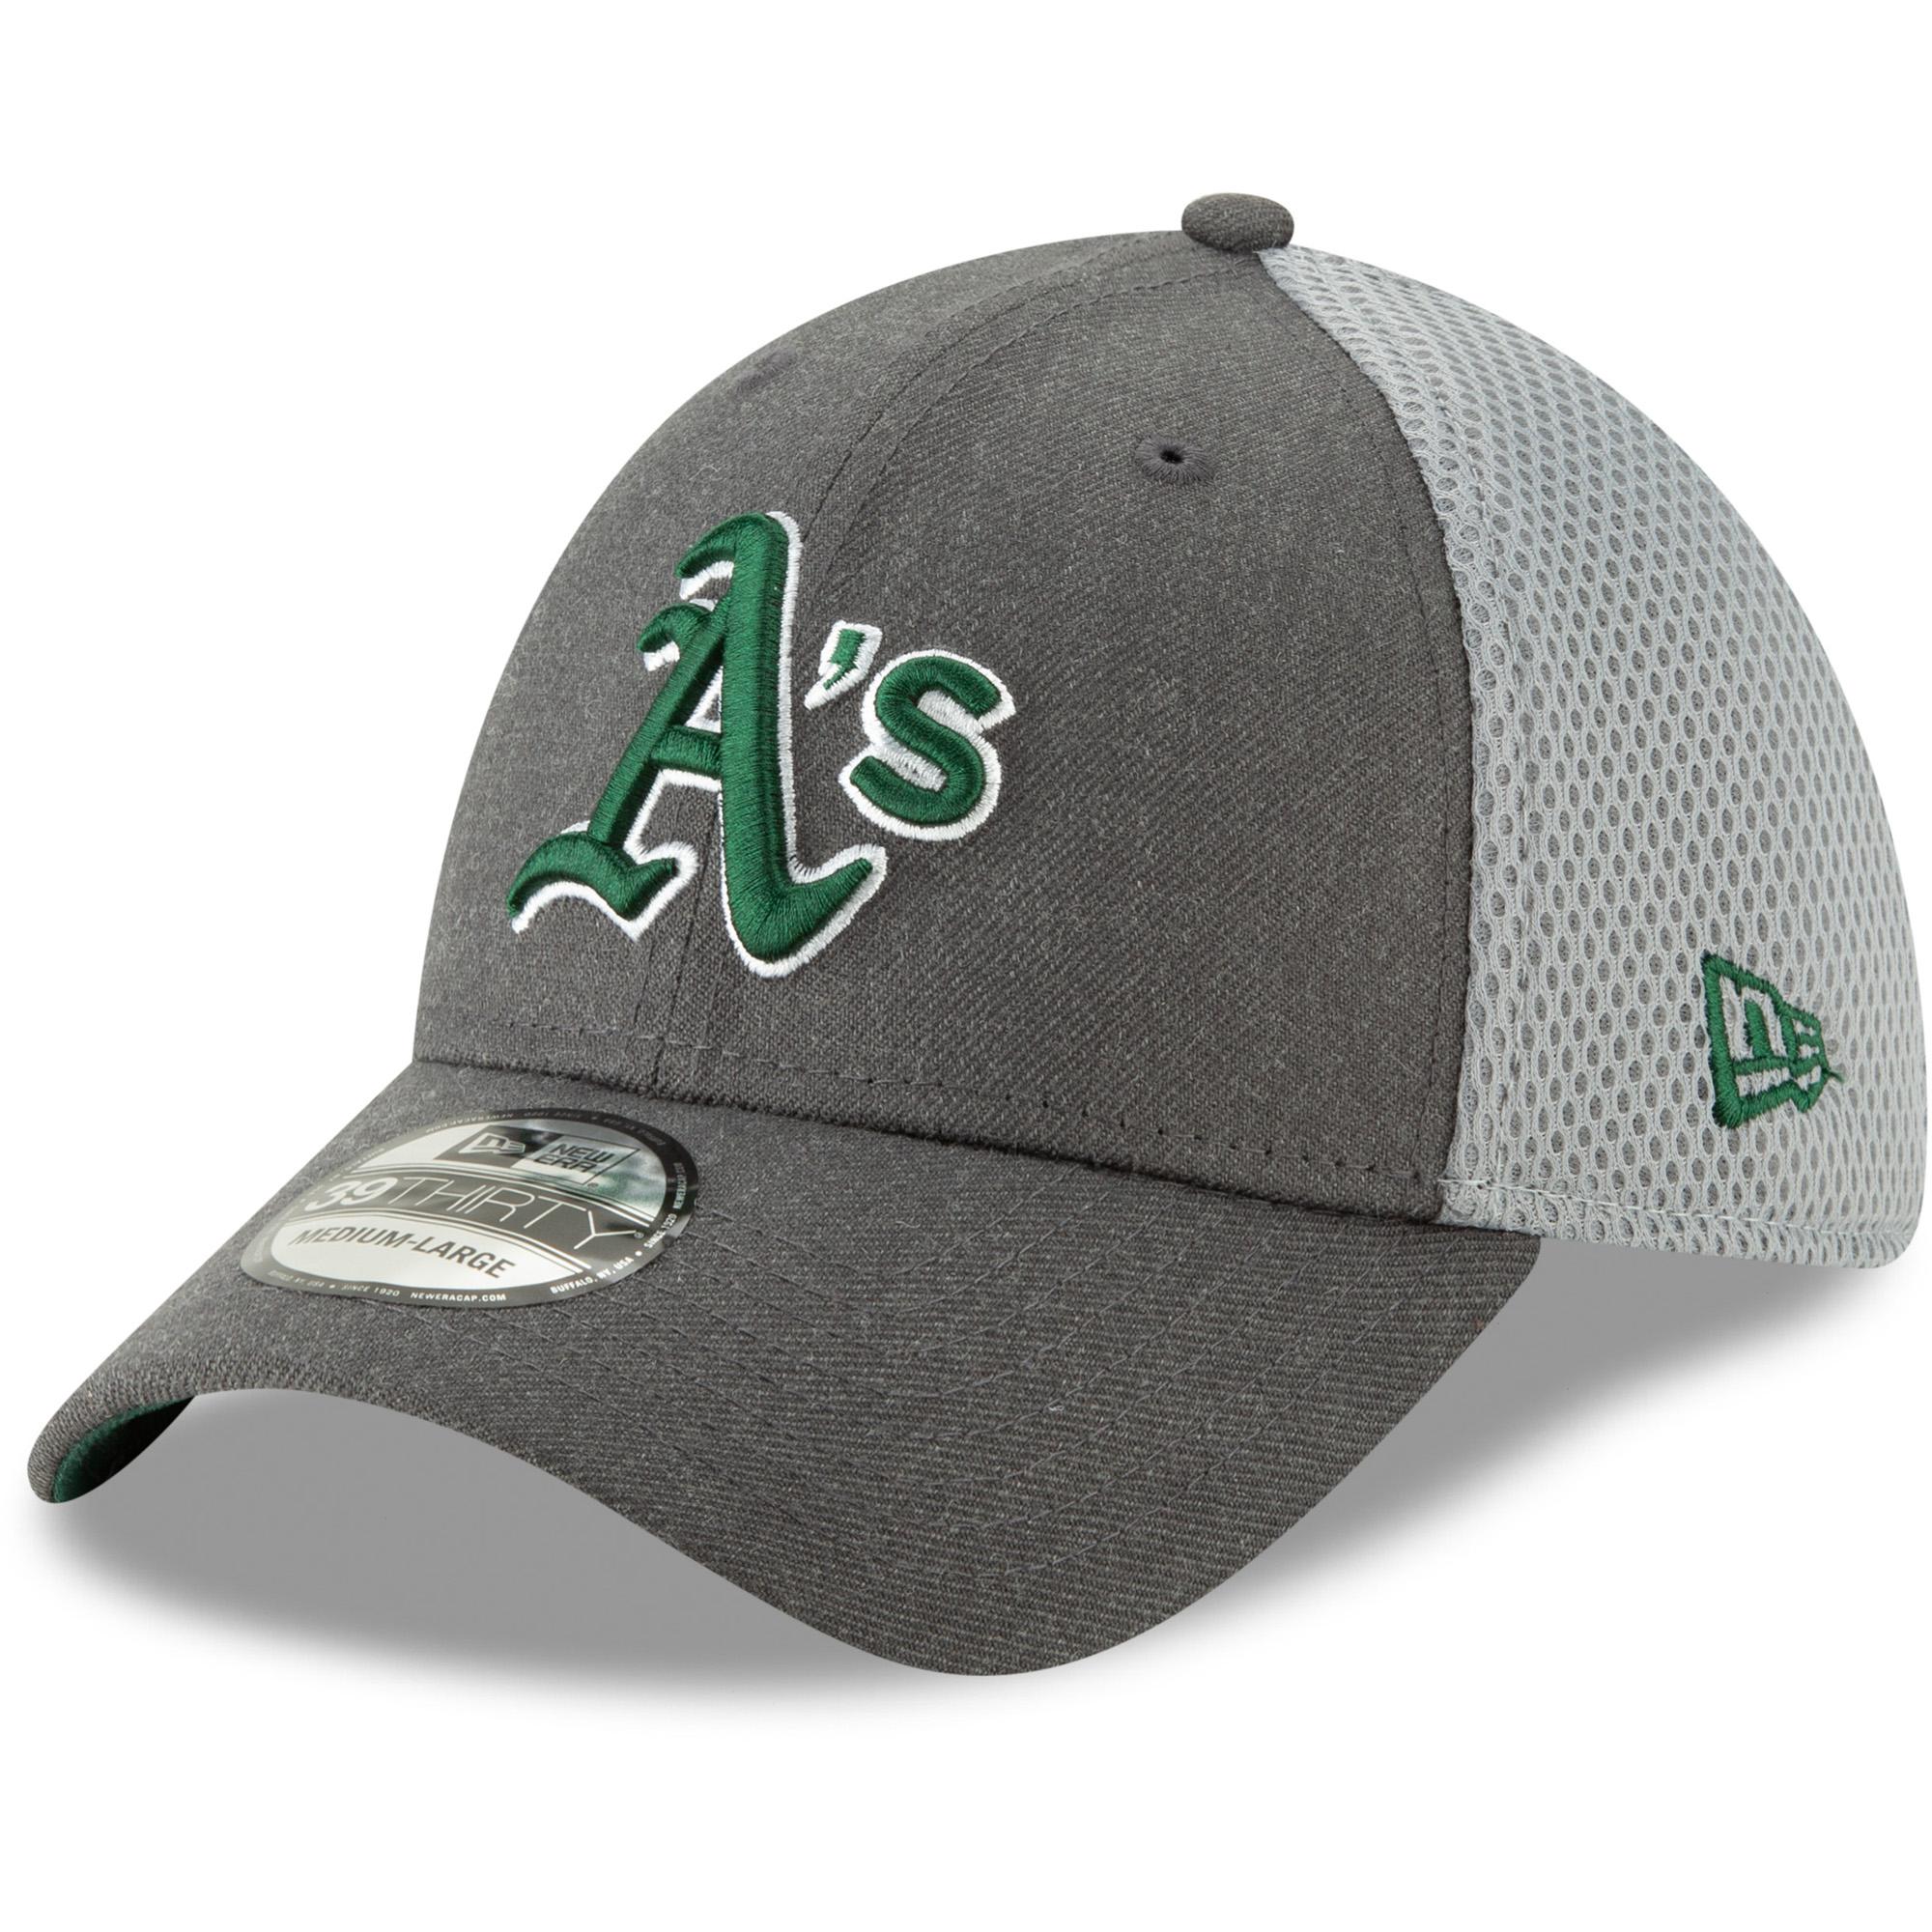 Oakland Athletics New Era Neo 39THIRTY Flex Hat - Graphite